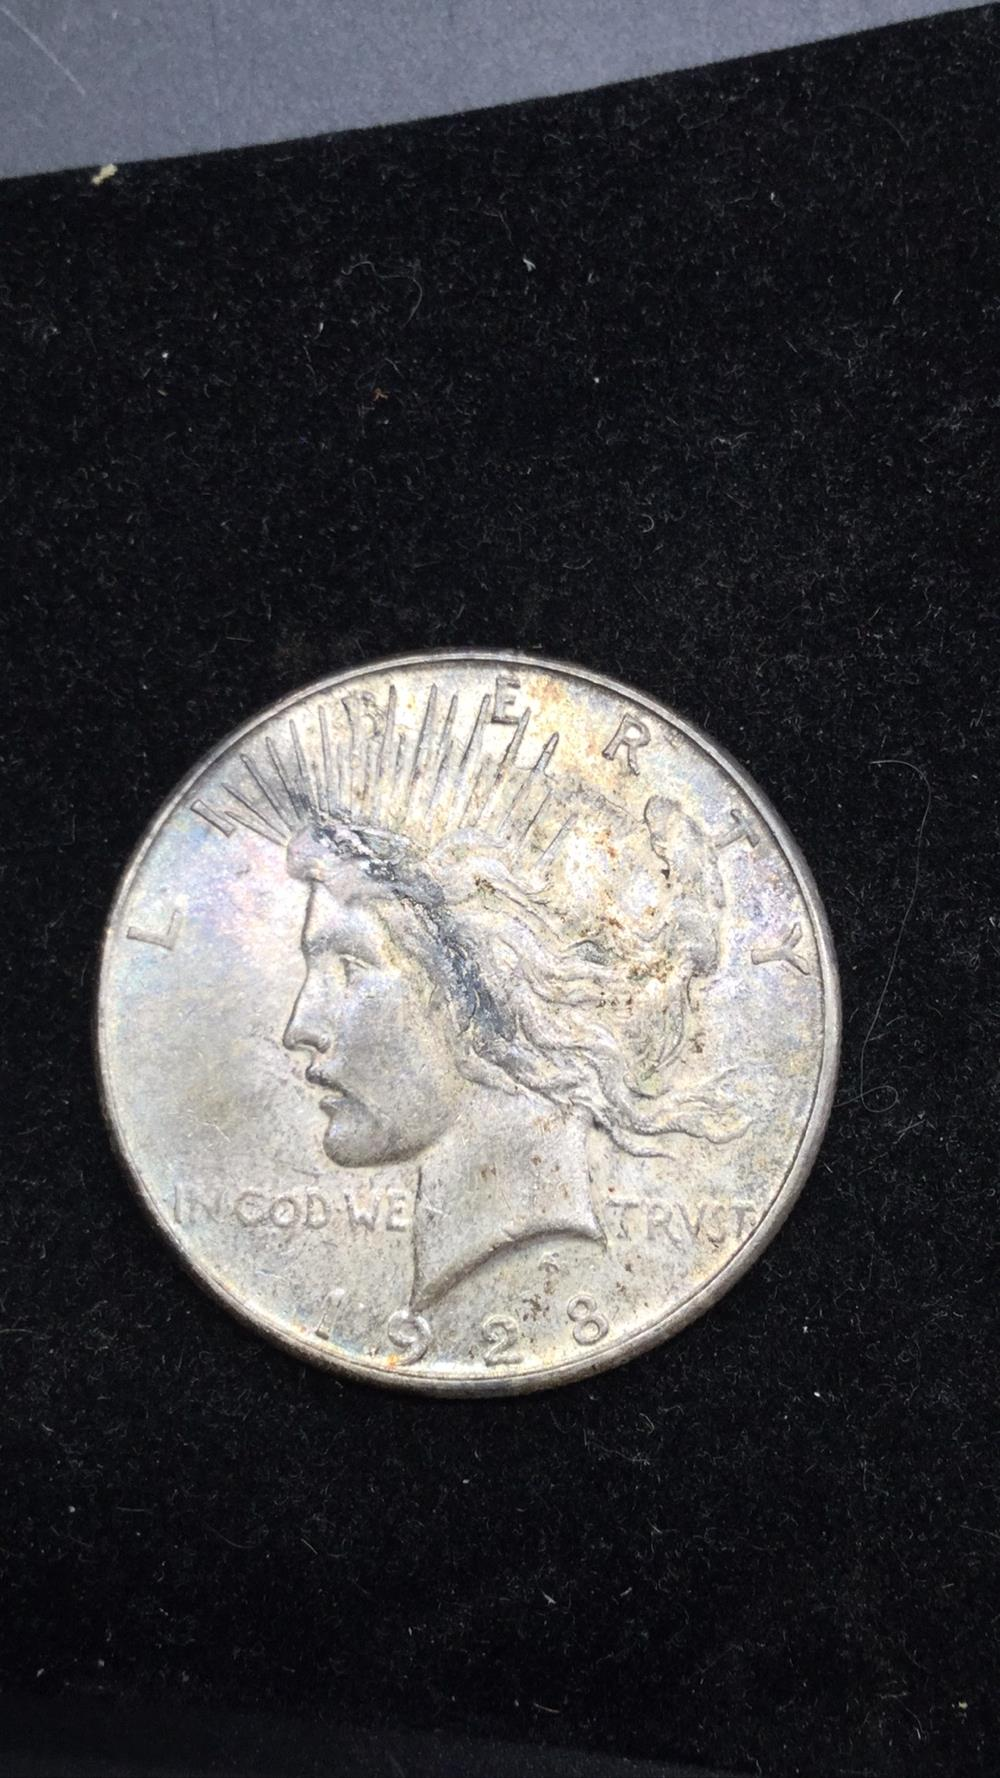 Lot 23: 1928 s Peace Dollar